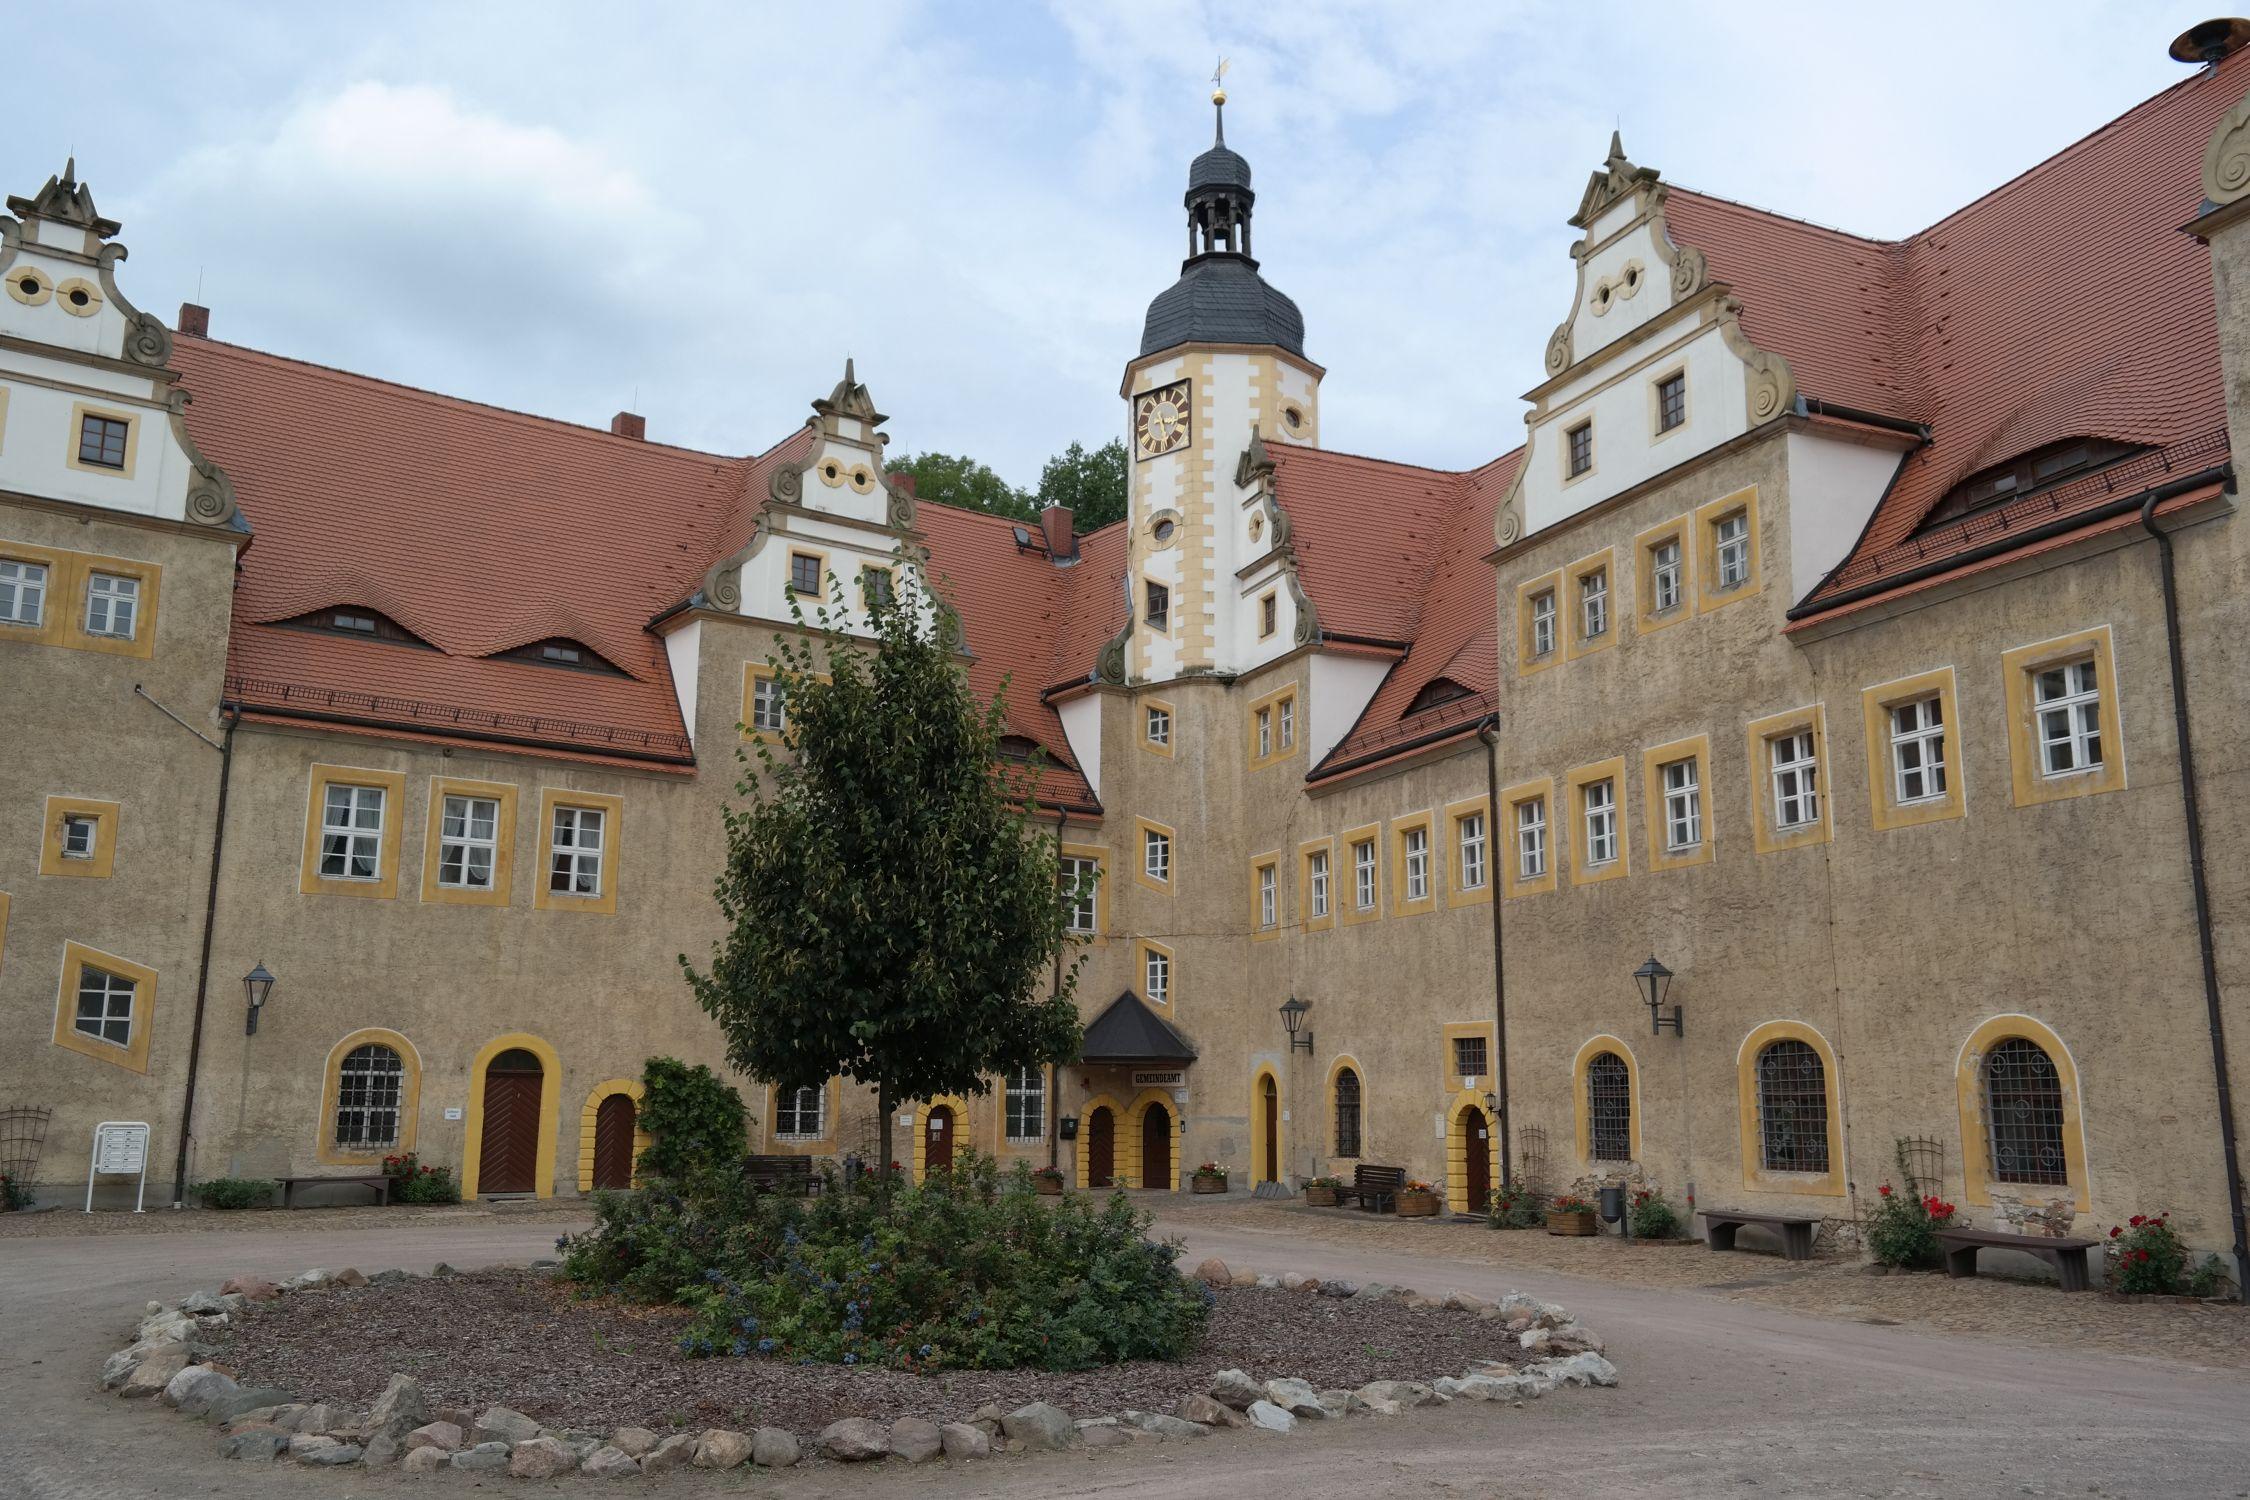 Altes Jagdschloss Wermsdorf